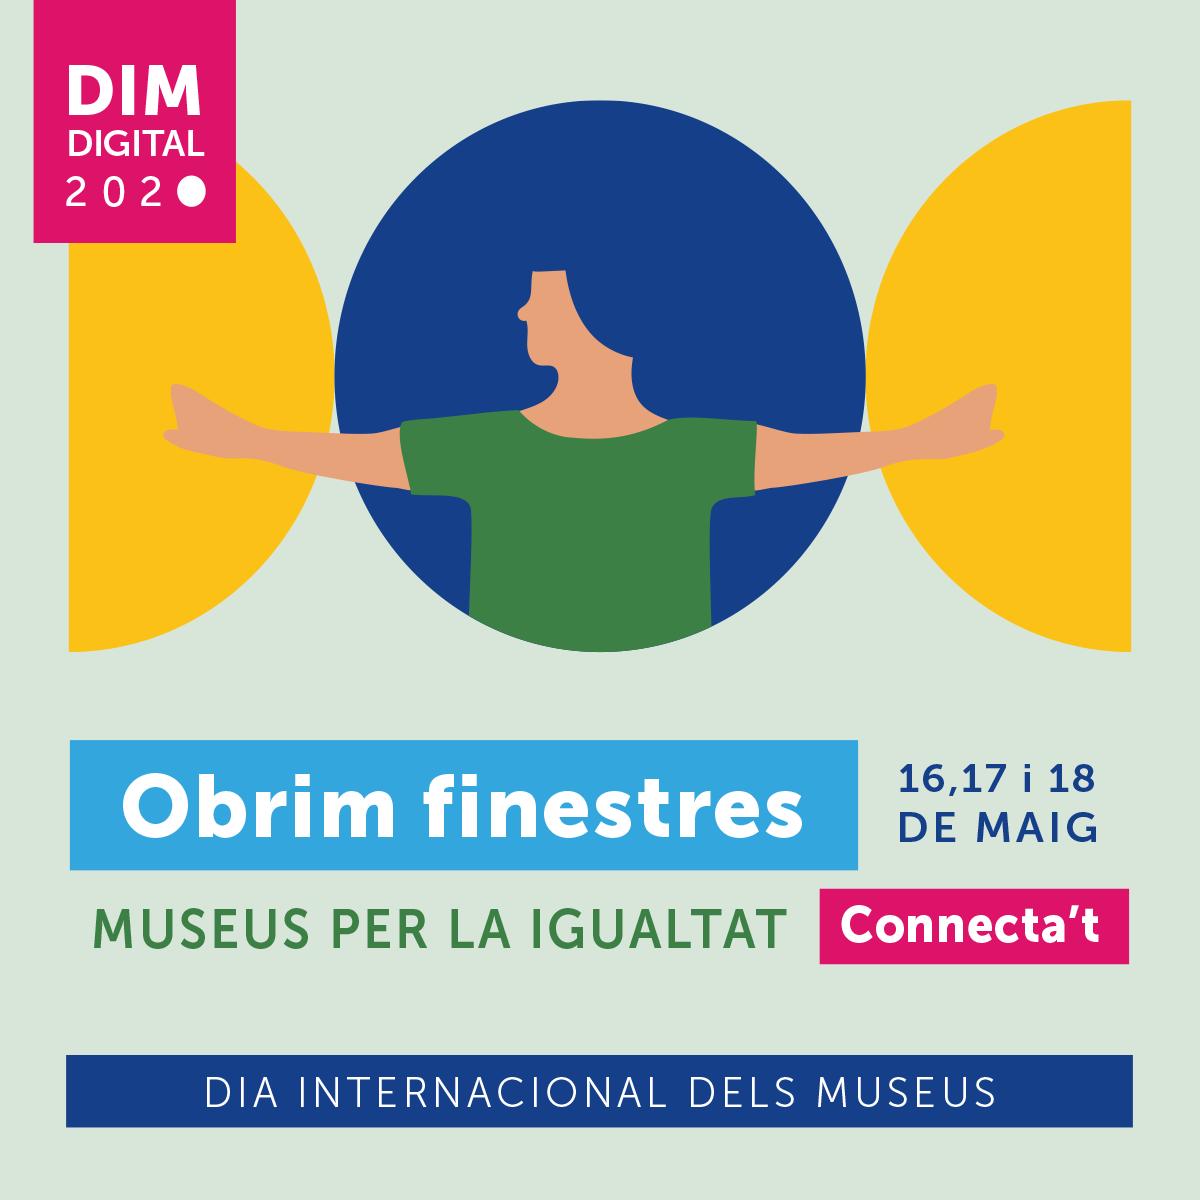 Els Museus de Manresa se sumen al Dia Internacional dels Museus, que enguany se celebra en format digital